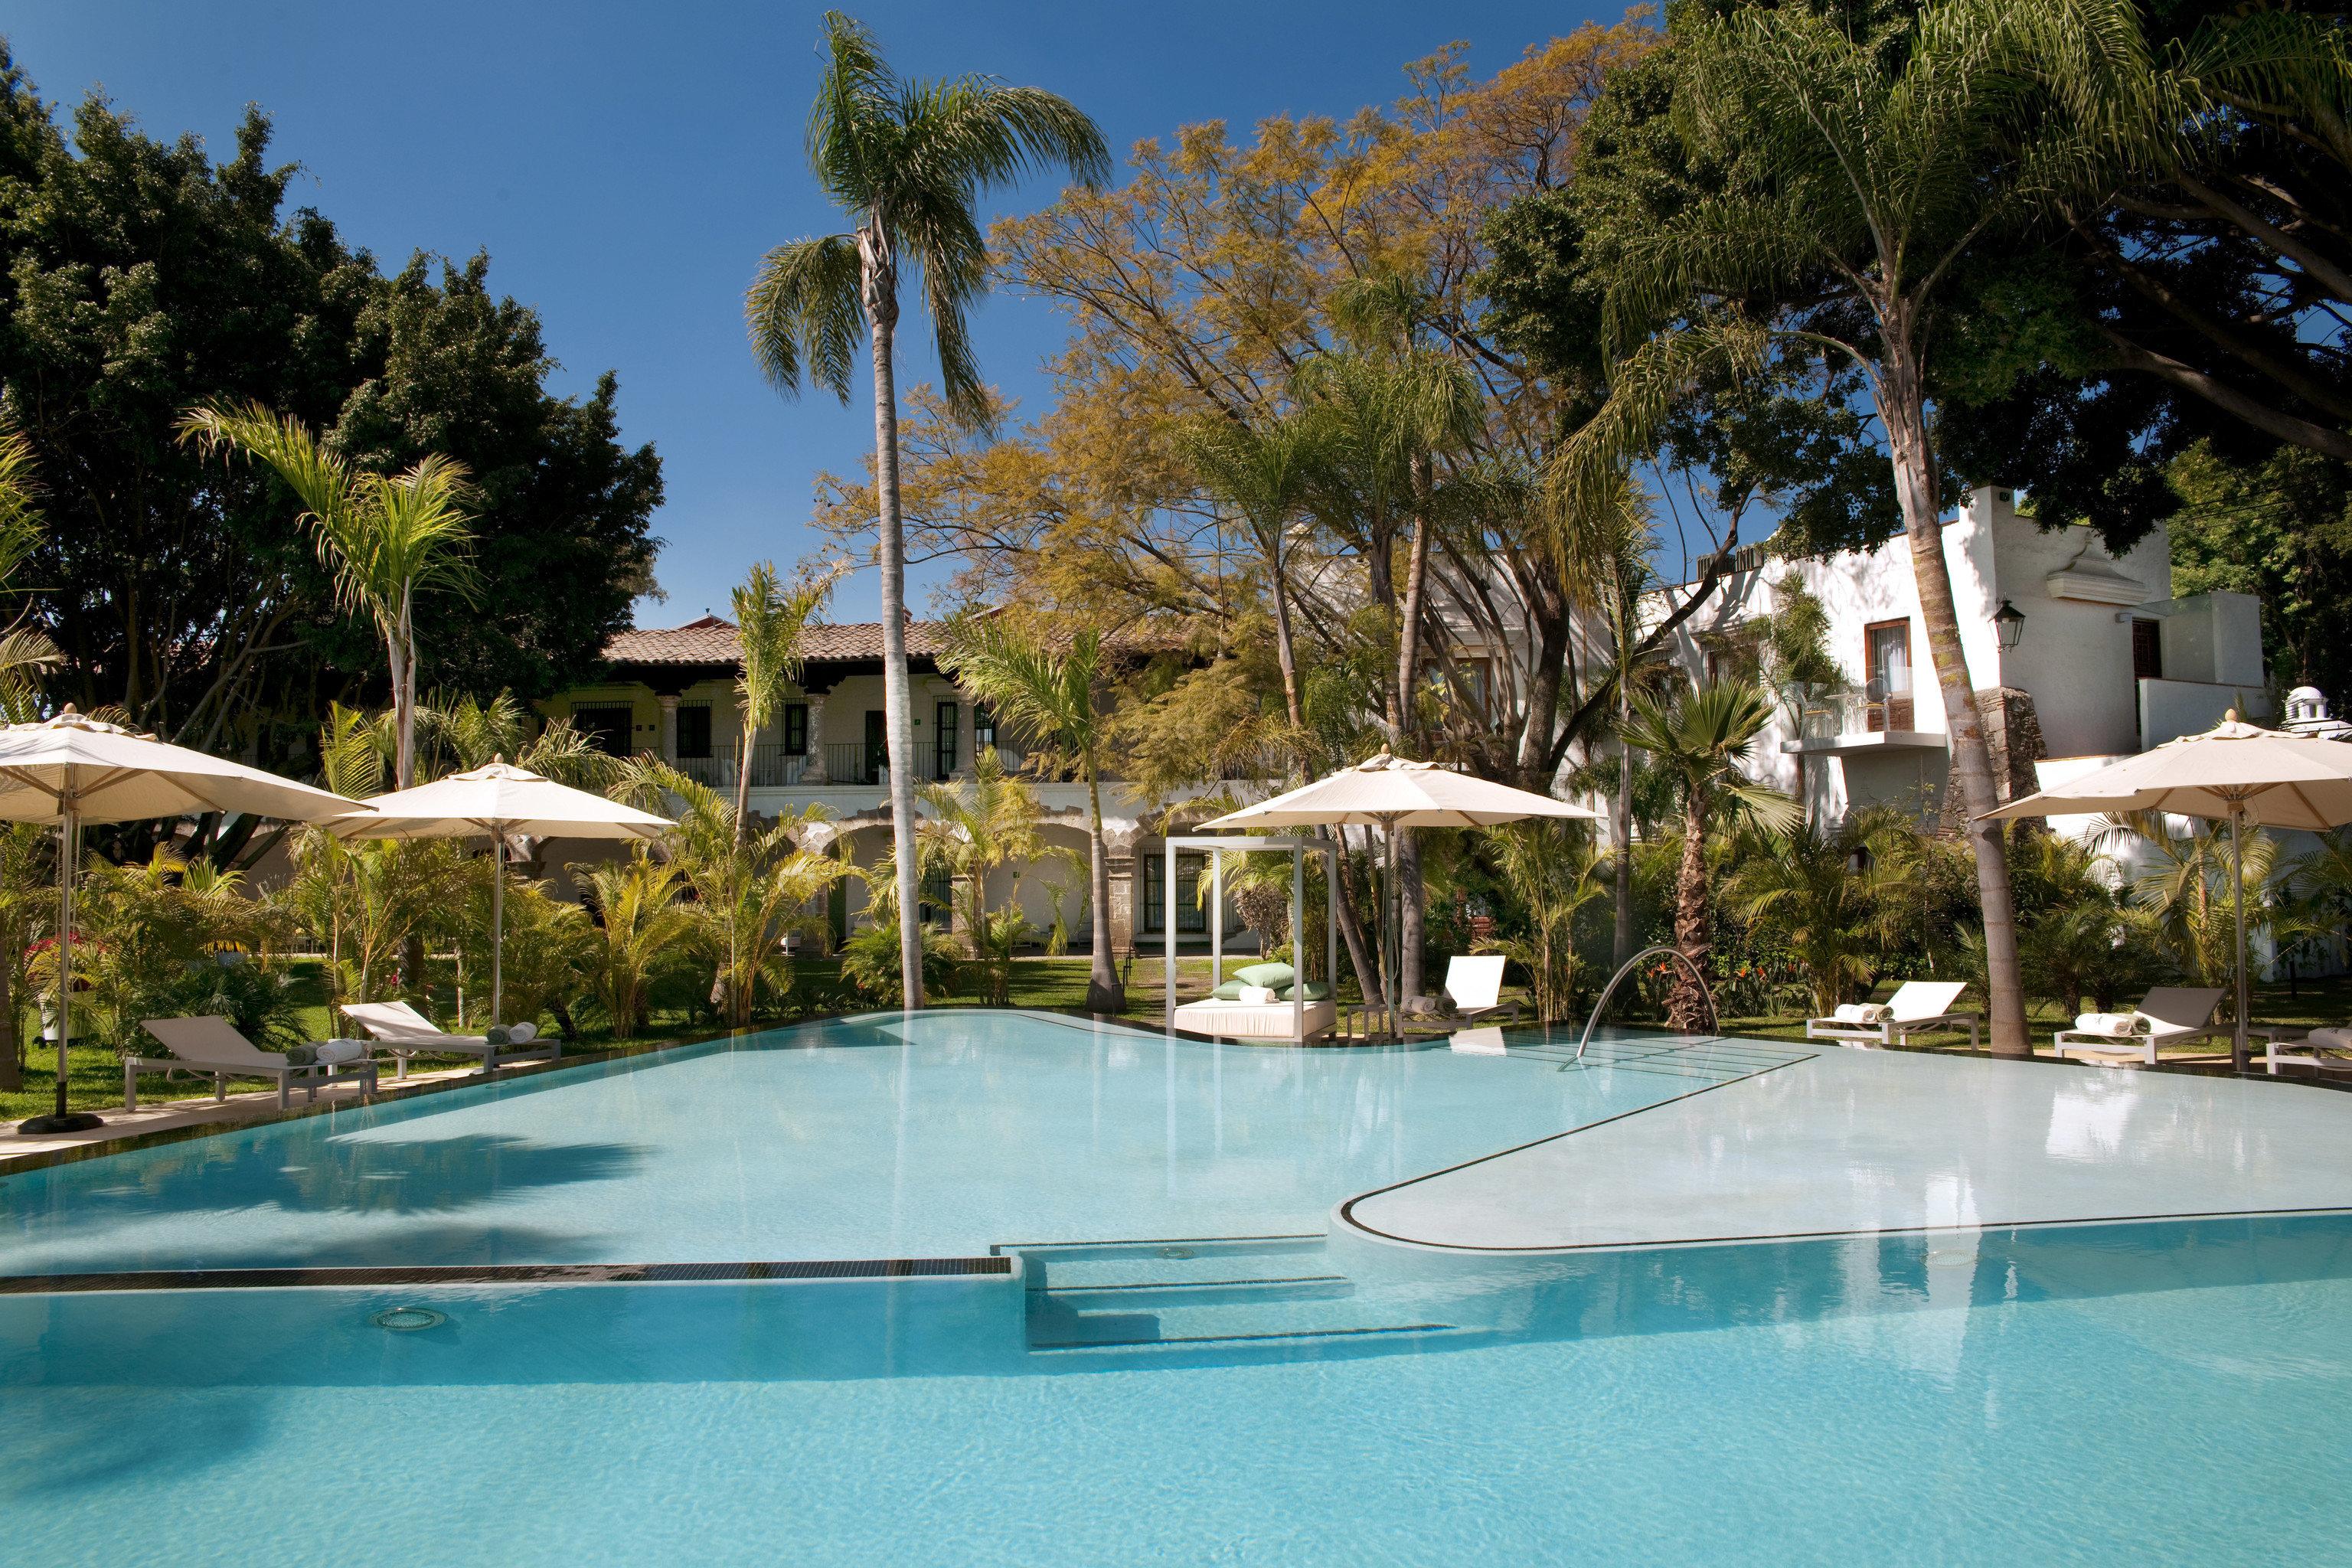 tree swimming pool property leisure Resort Villa blue resort town home backyard Pool